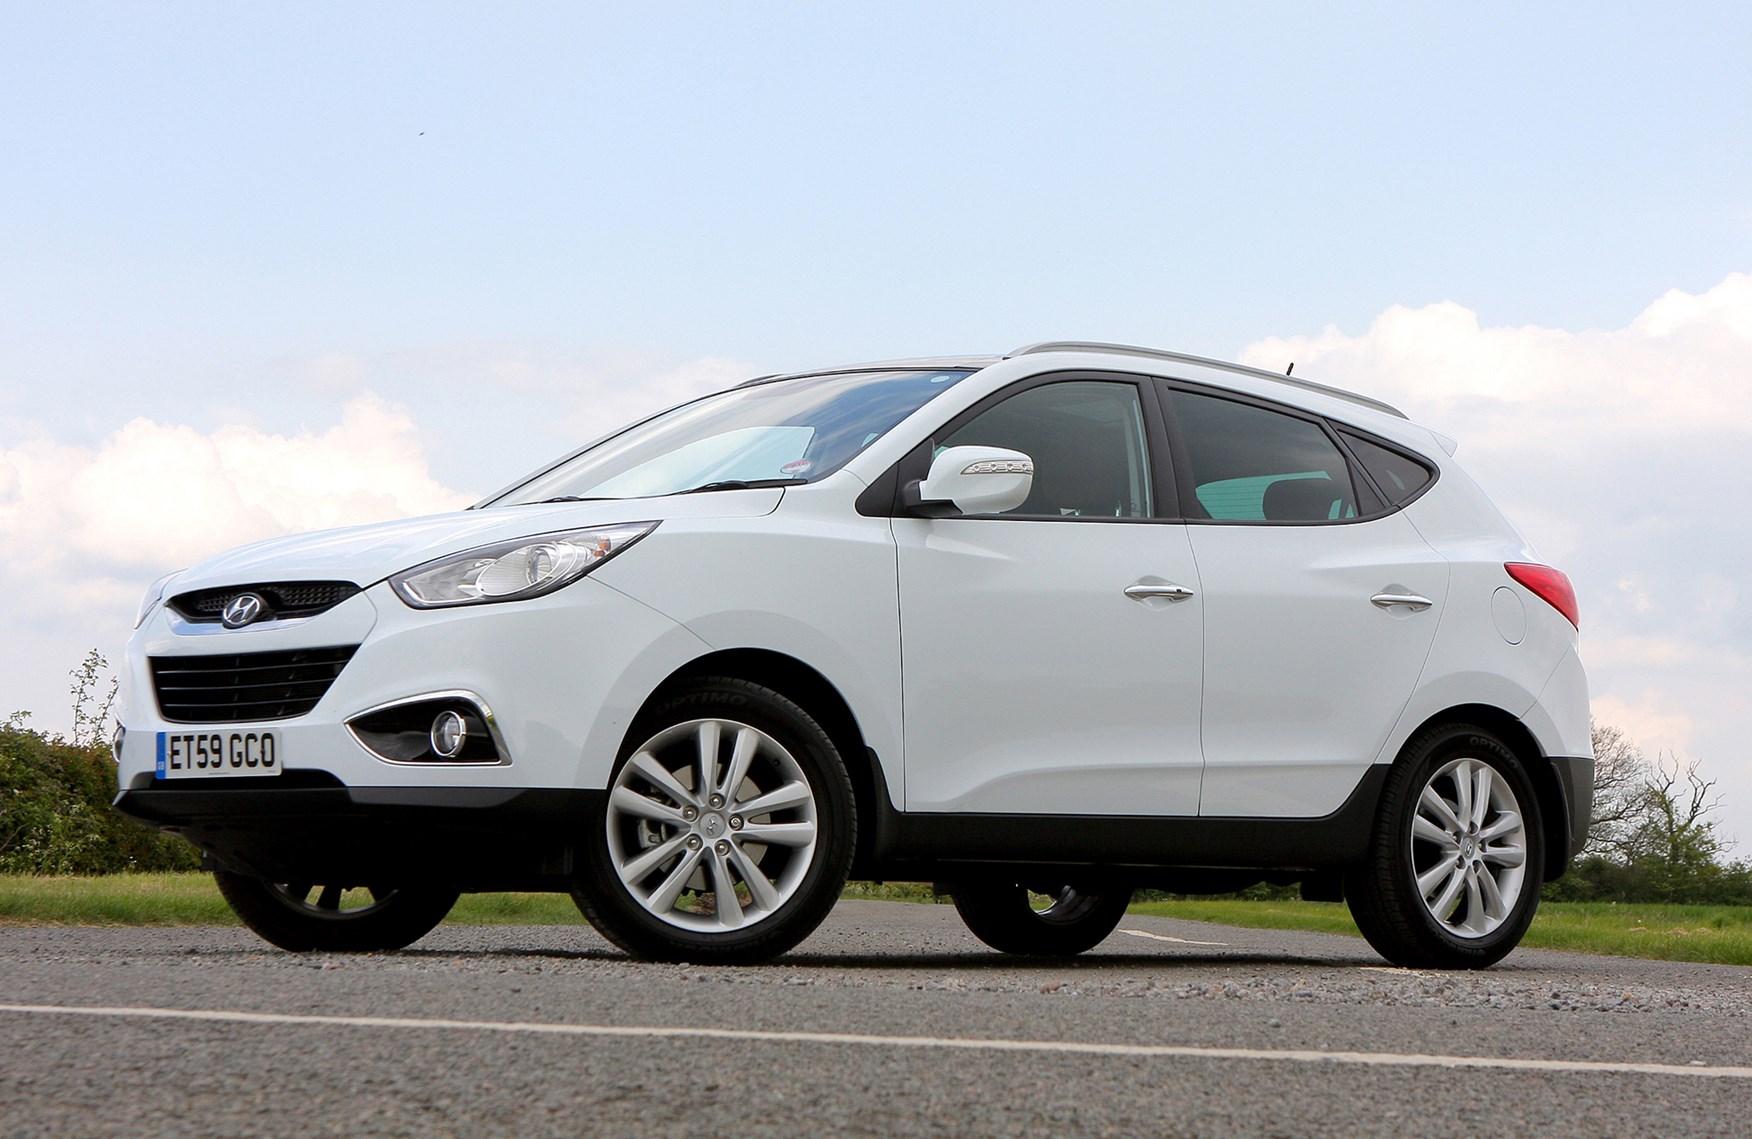 Hyundai Ix Used Cars For Sale Uk